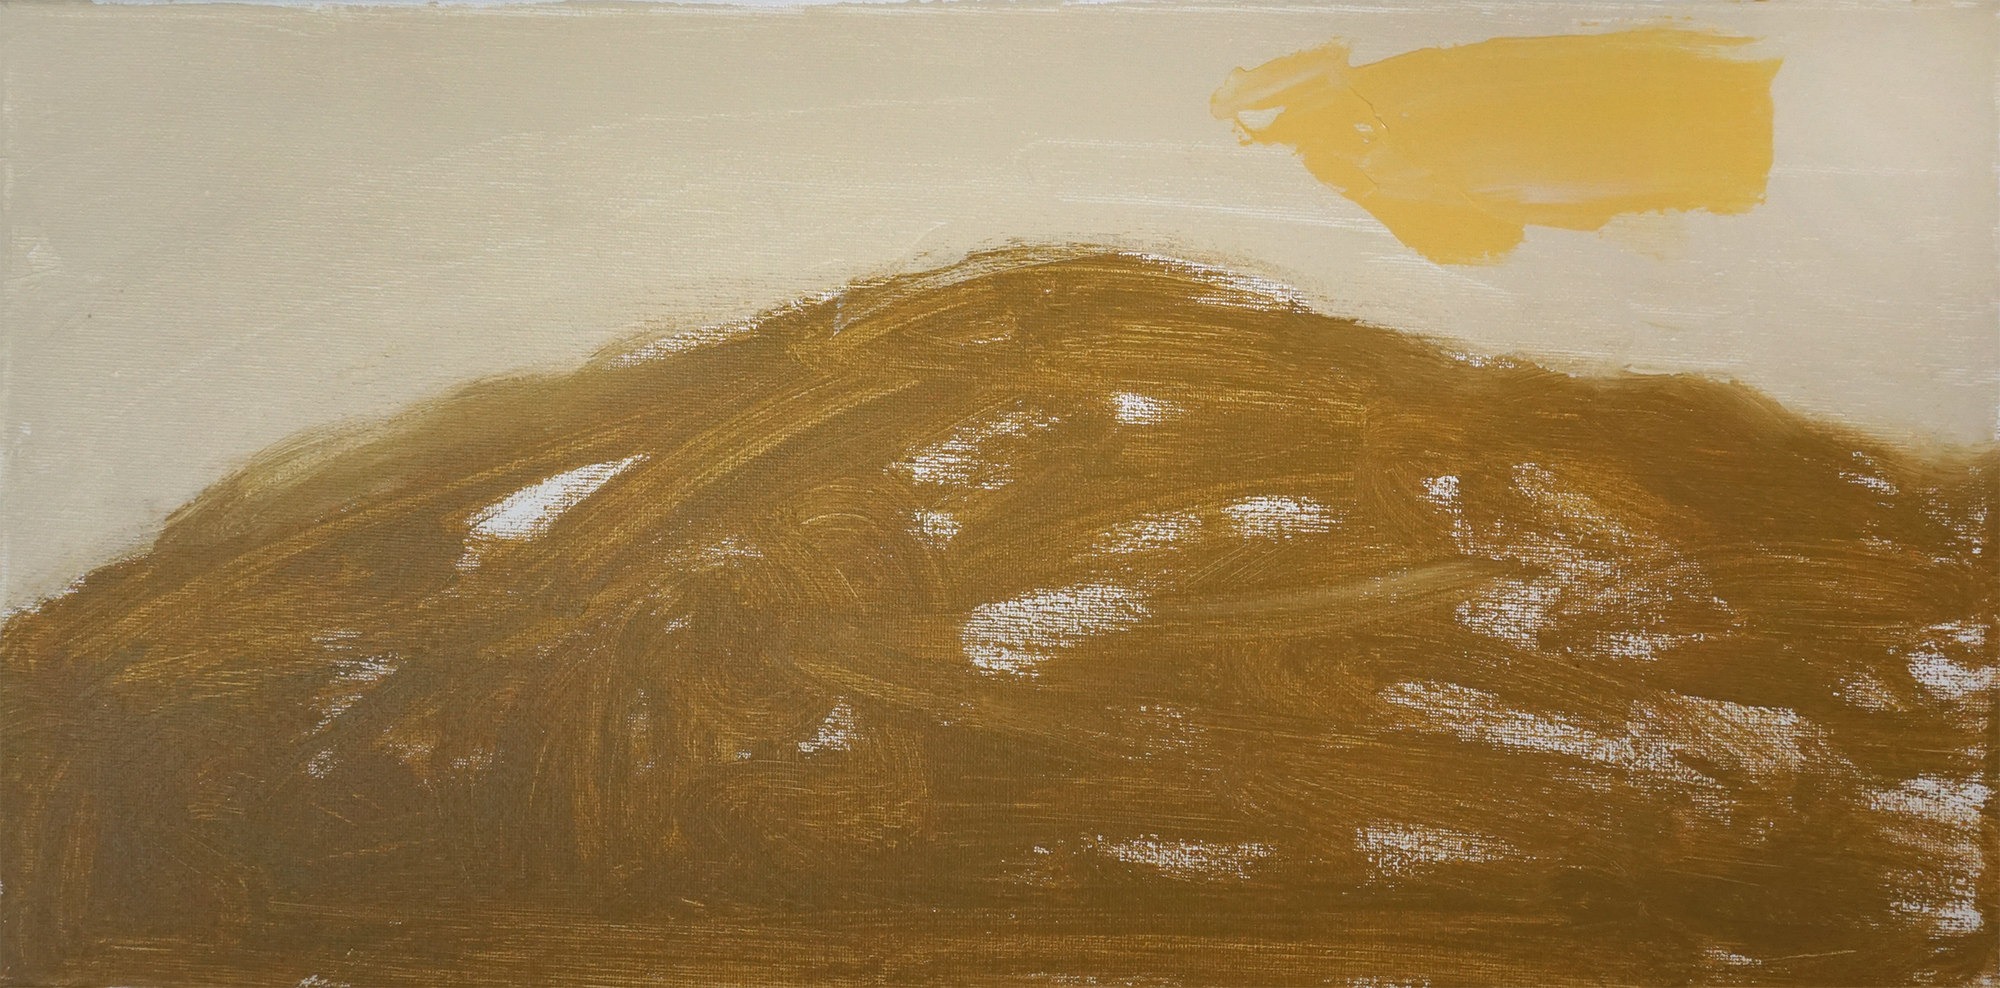 Desert03   20''x10'' Acrylic paint on Canvas